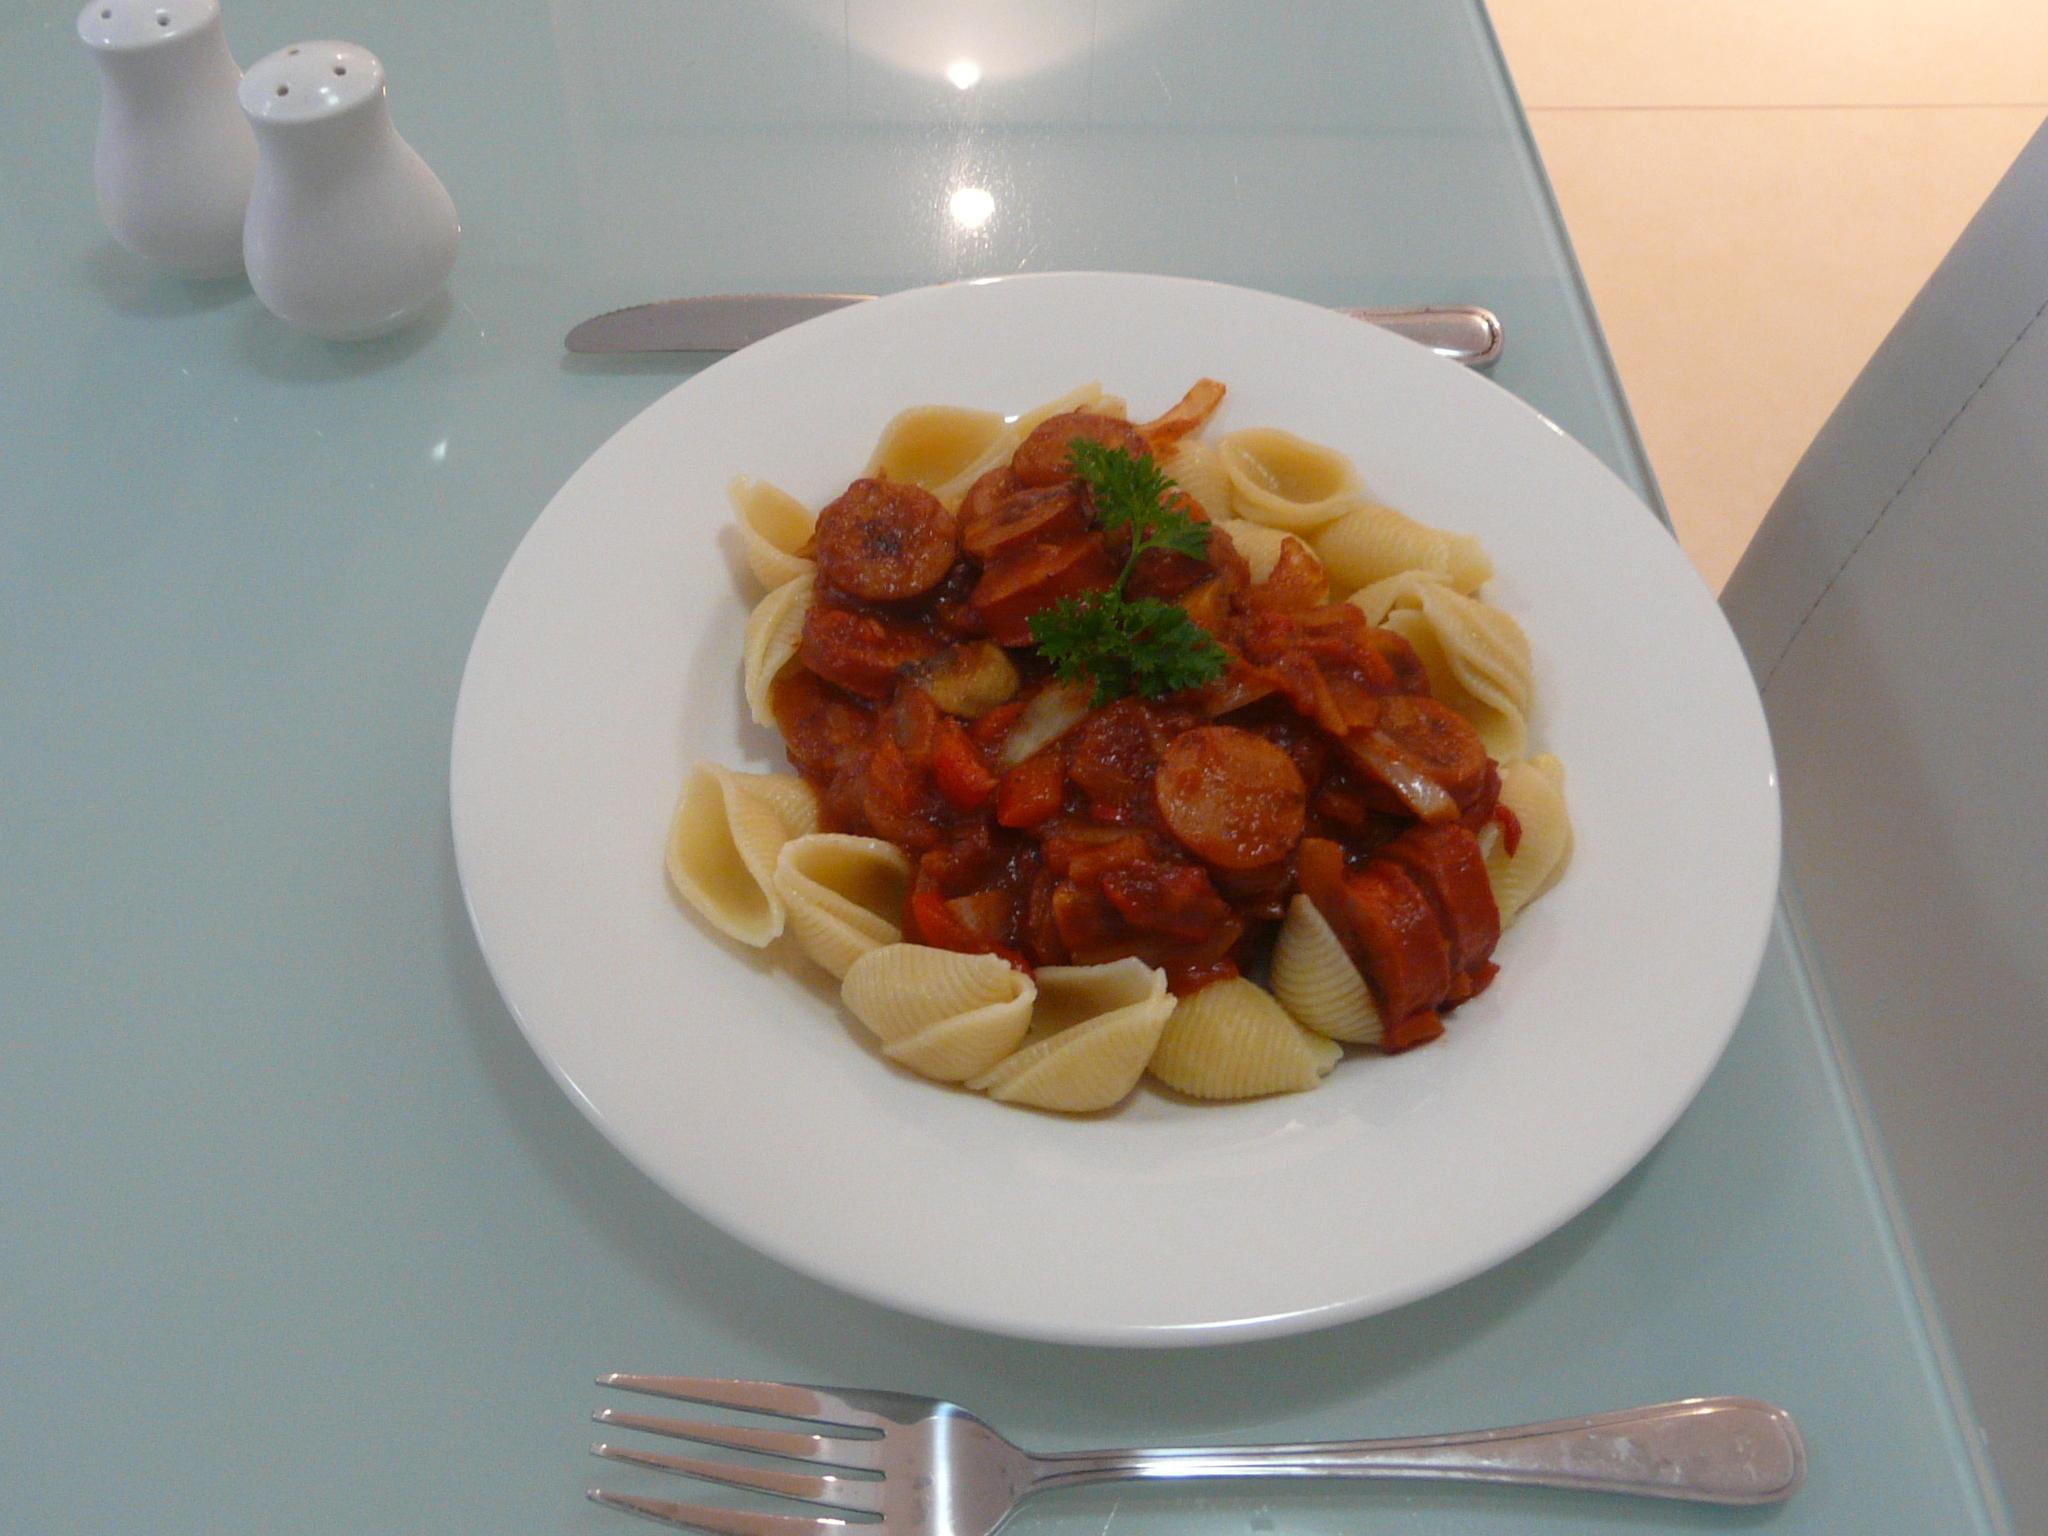 korvgryta med pasta